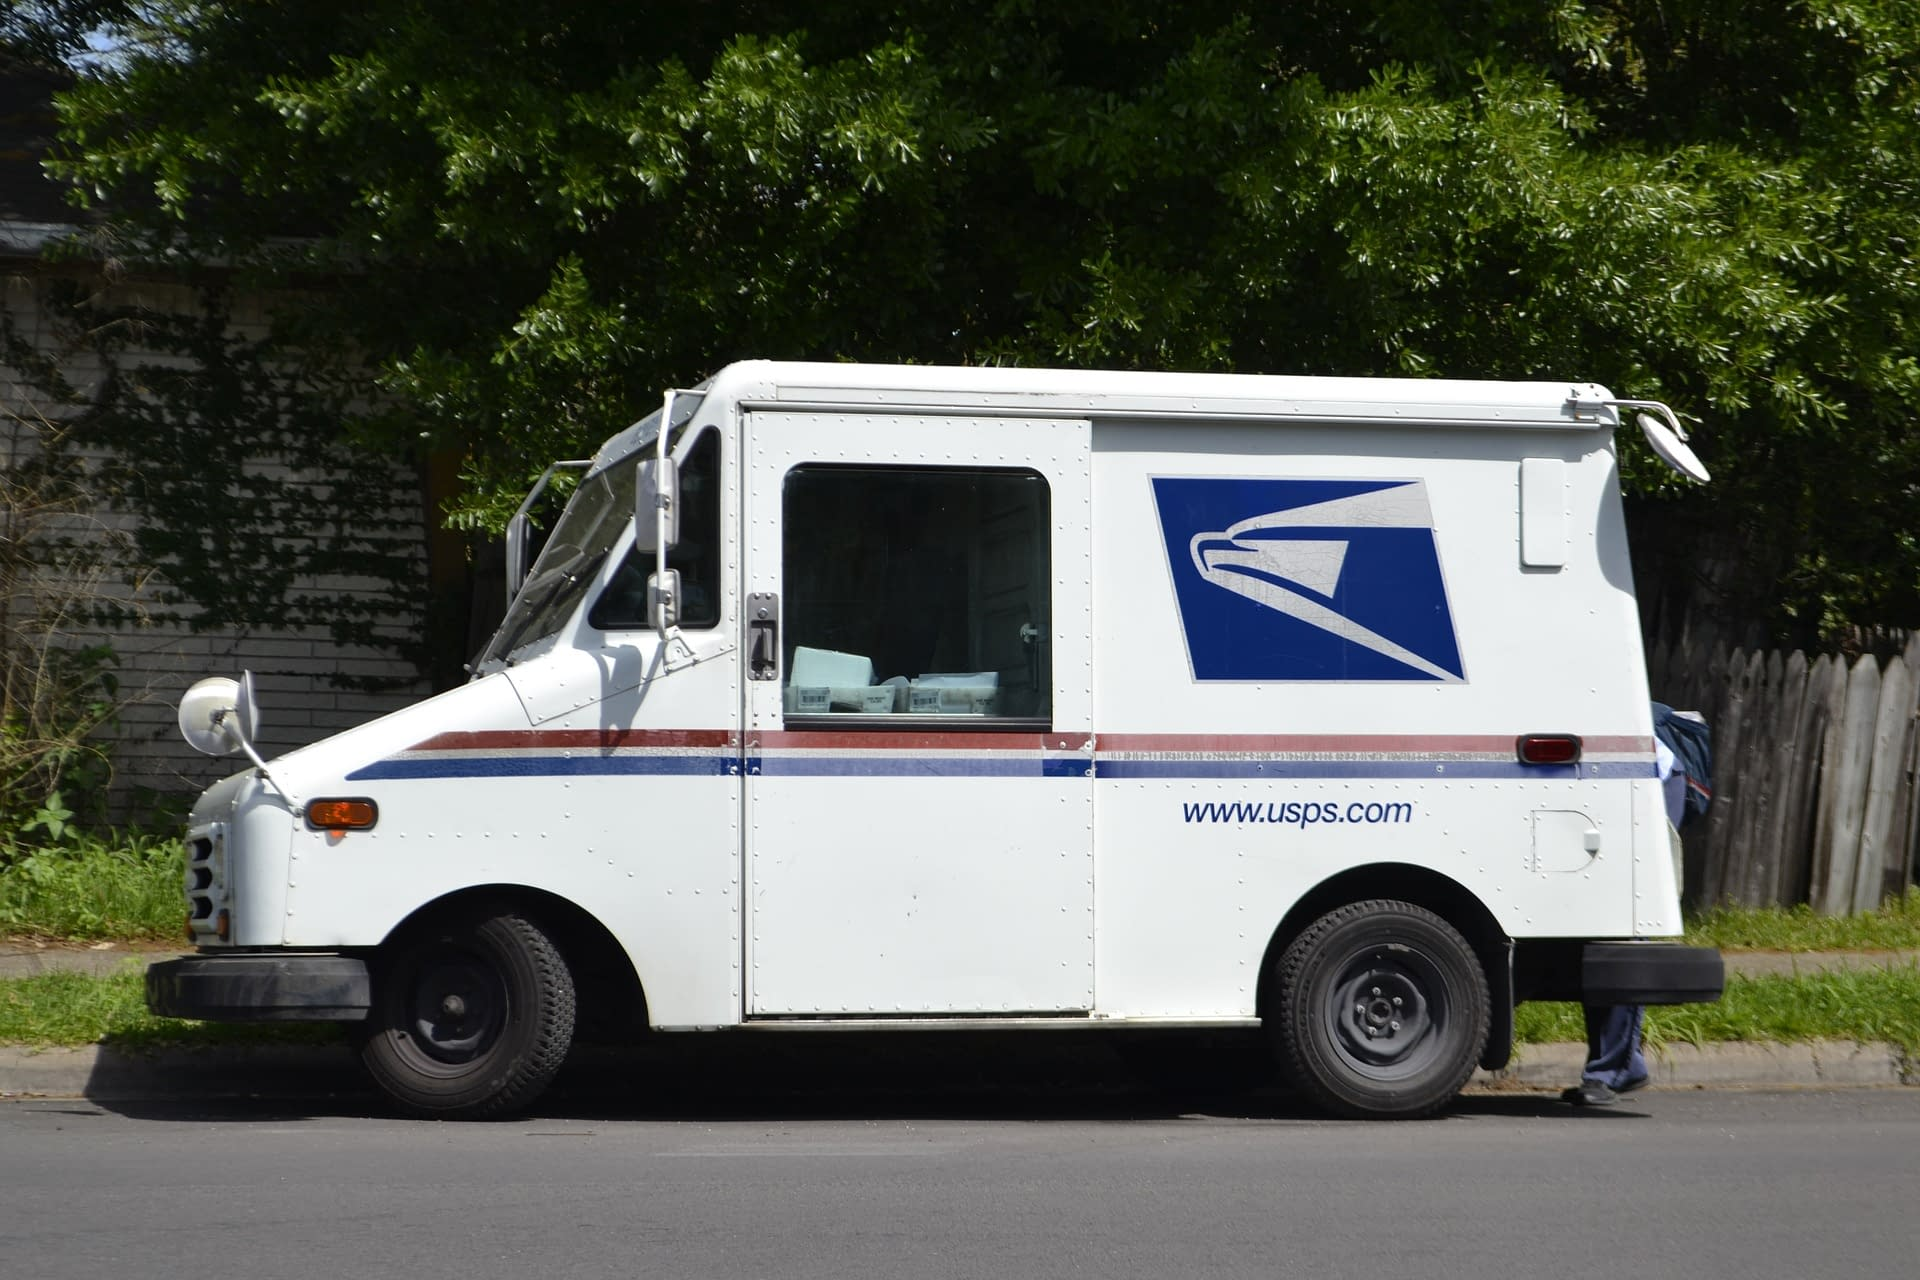 Where to get free USPS boxes, UPS boxes, plain boxes, envelopes, etc.